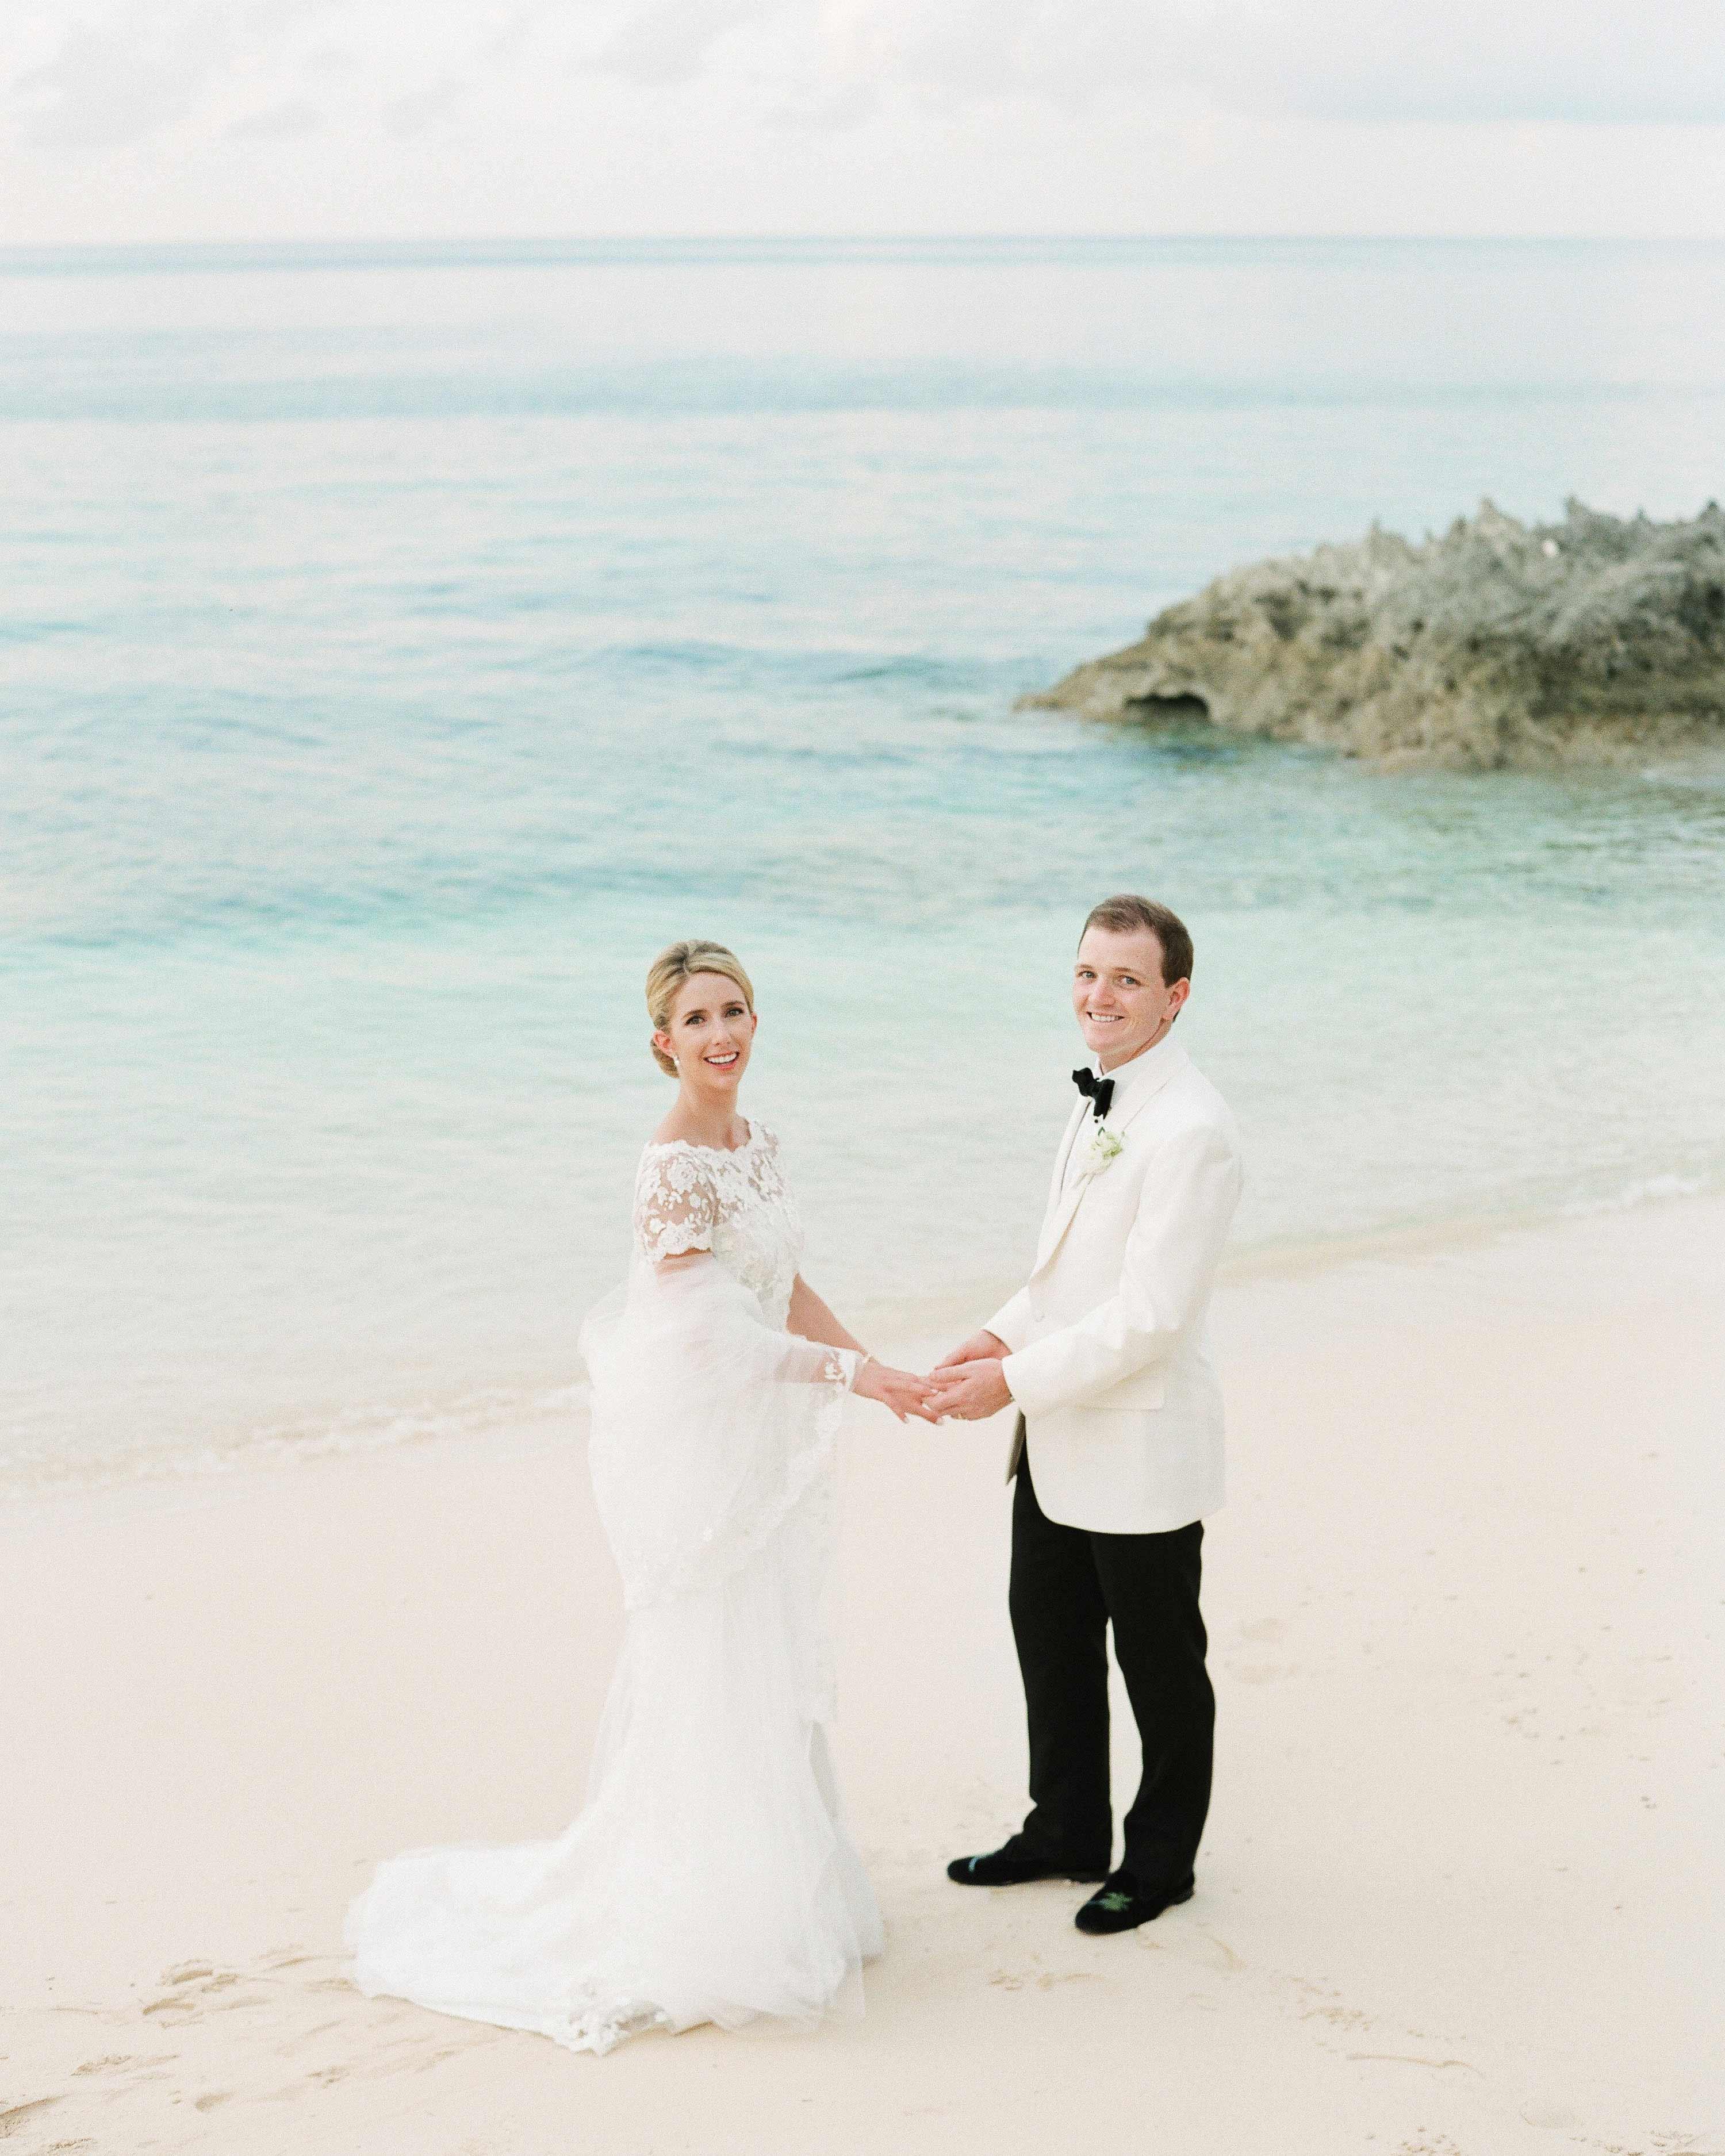 kelsey-casey-real-wedding-bride-and-groom-potrait-on-beach.jpg